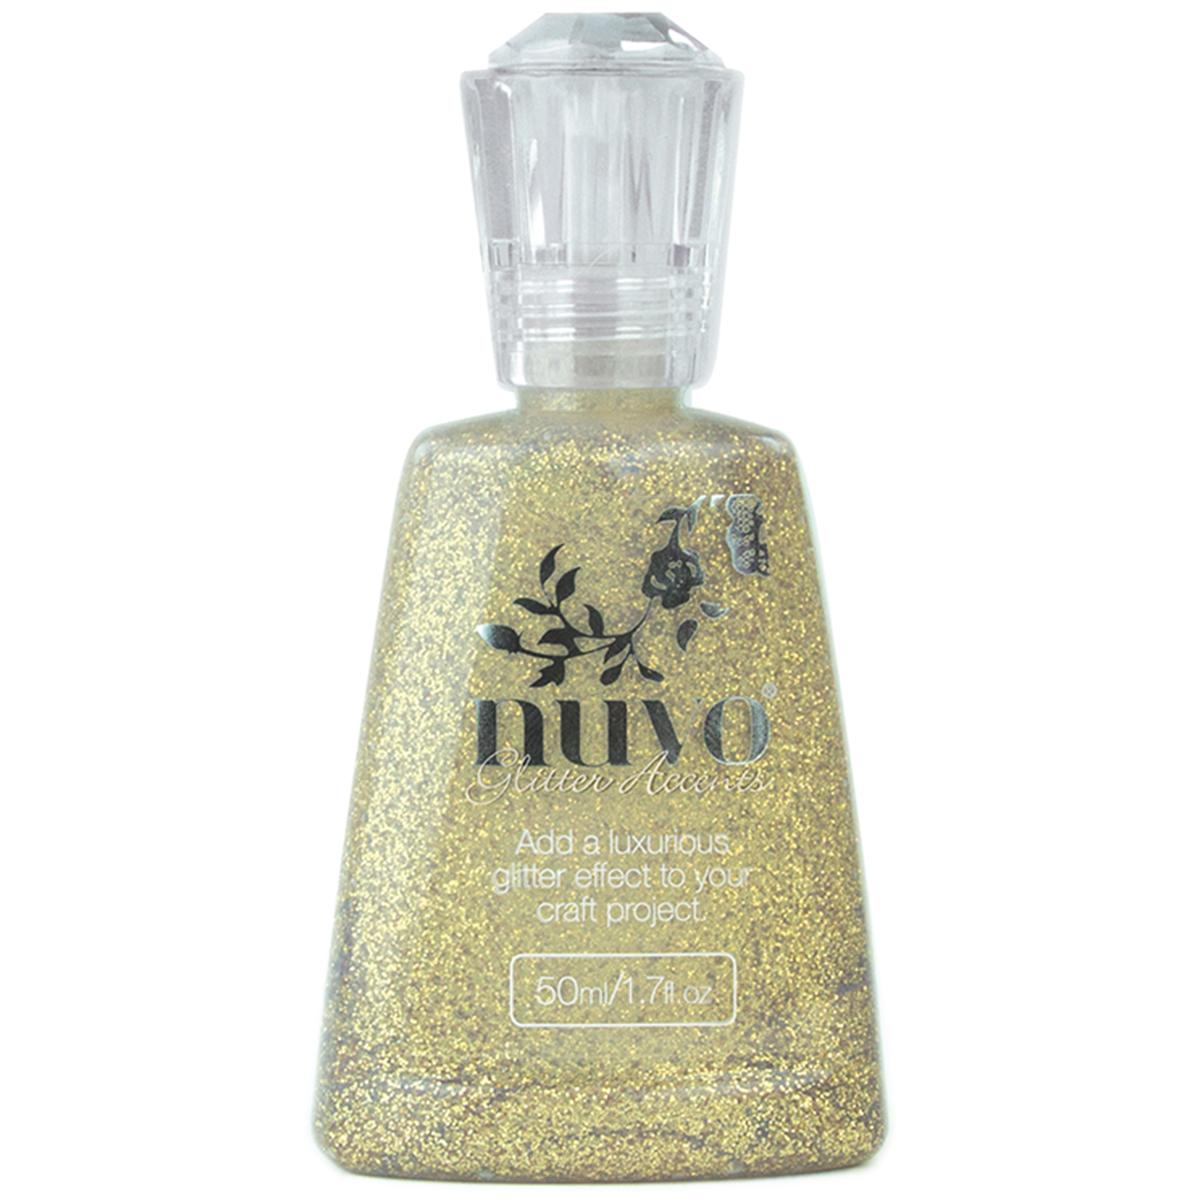 MIXED MEDIA - NUVO GLITTTER AZTEC GOLD